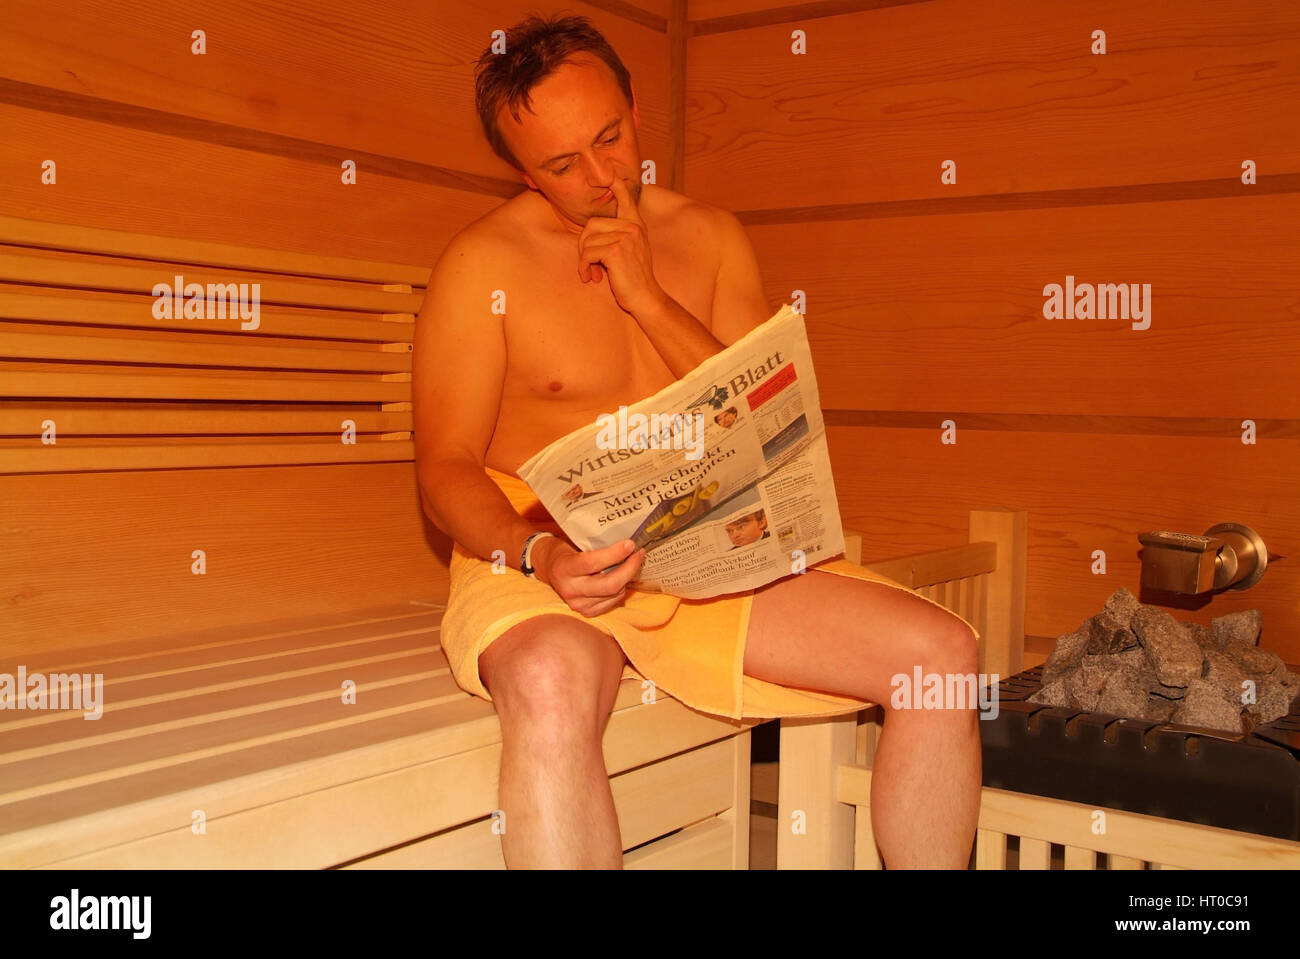 Mann liest Zeitung en Sauna - mujer en sauna Imagen De Stock